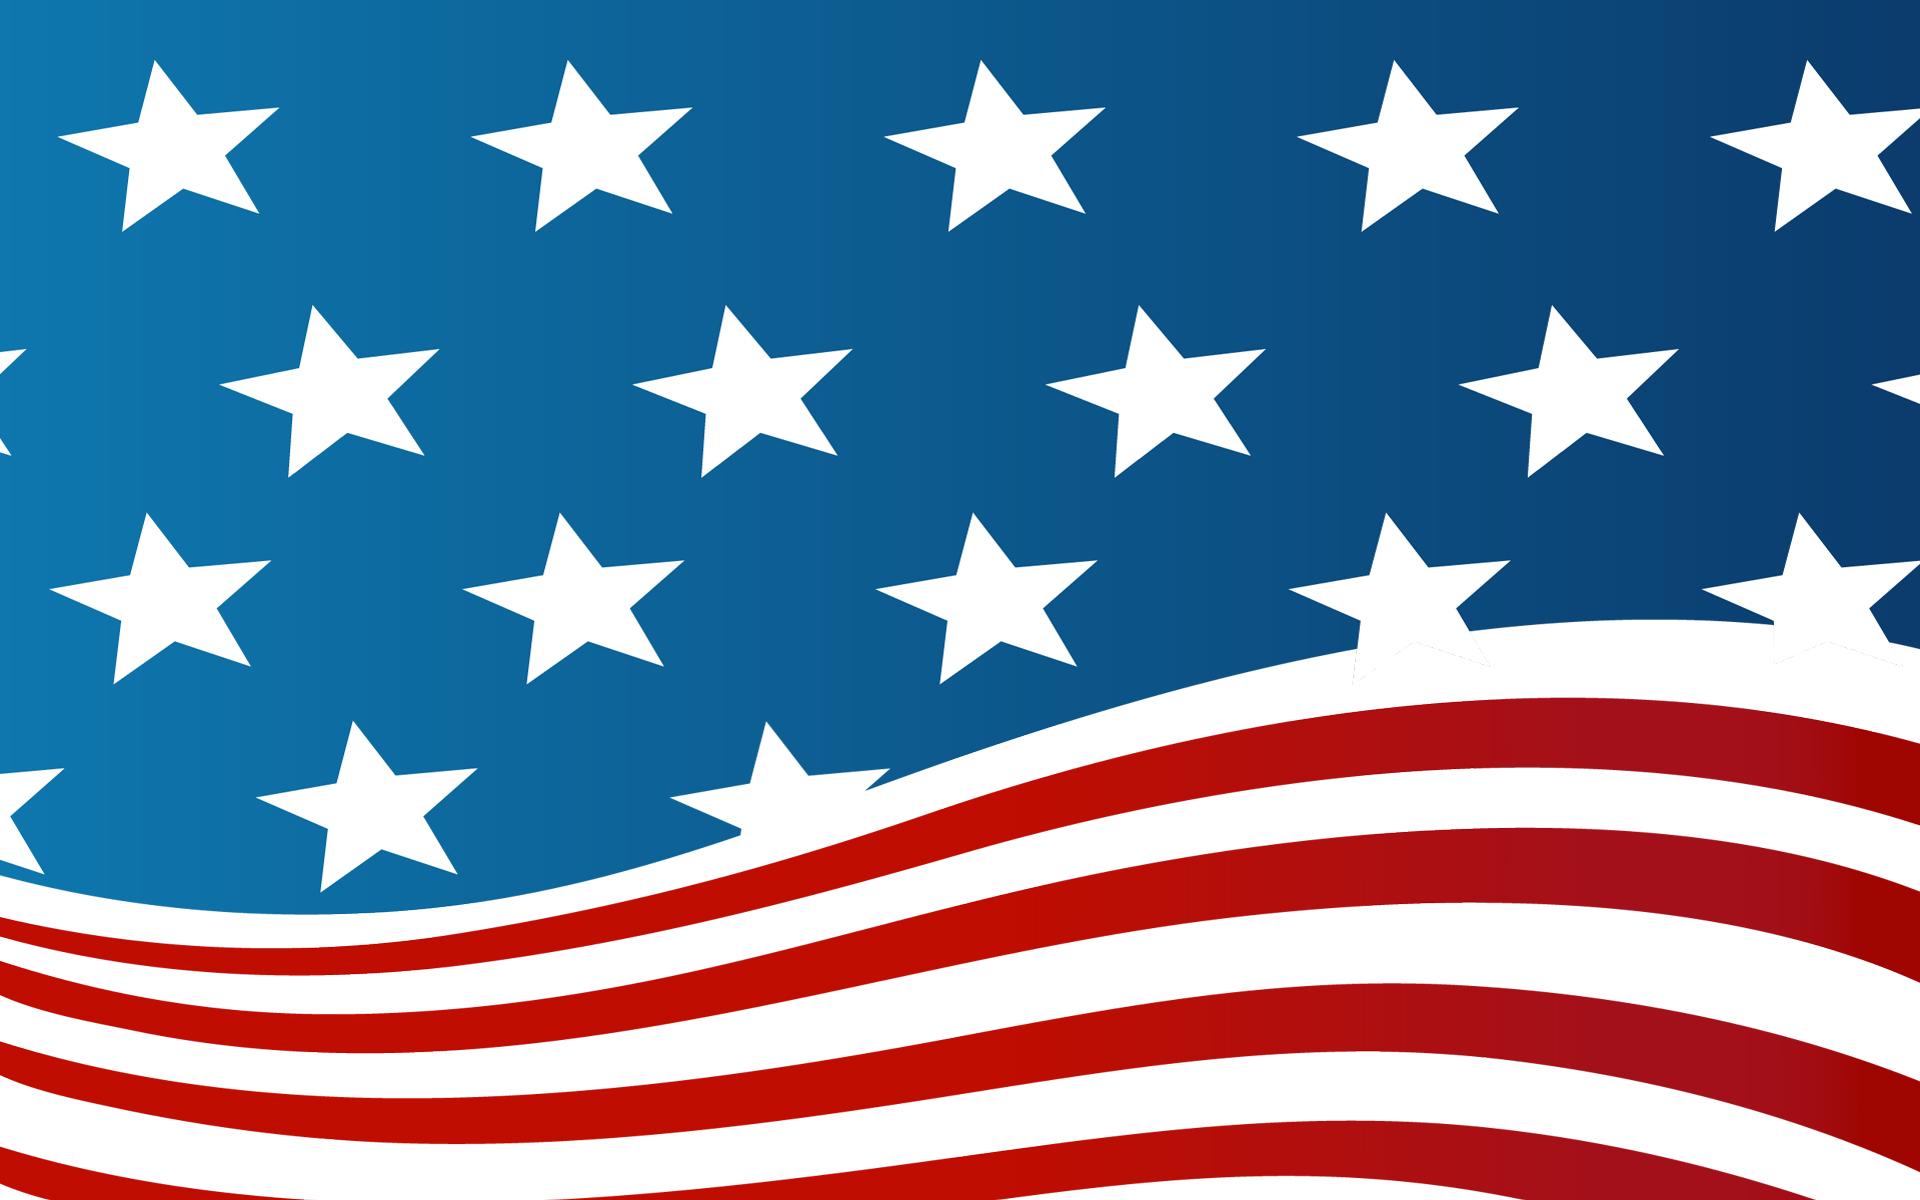 45778 Заставки и Обои Флаги на телефон. Скачать Сша (Usa), Флаги, Фон картинки бесплатно